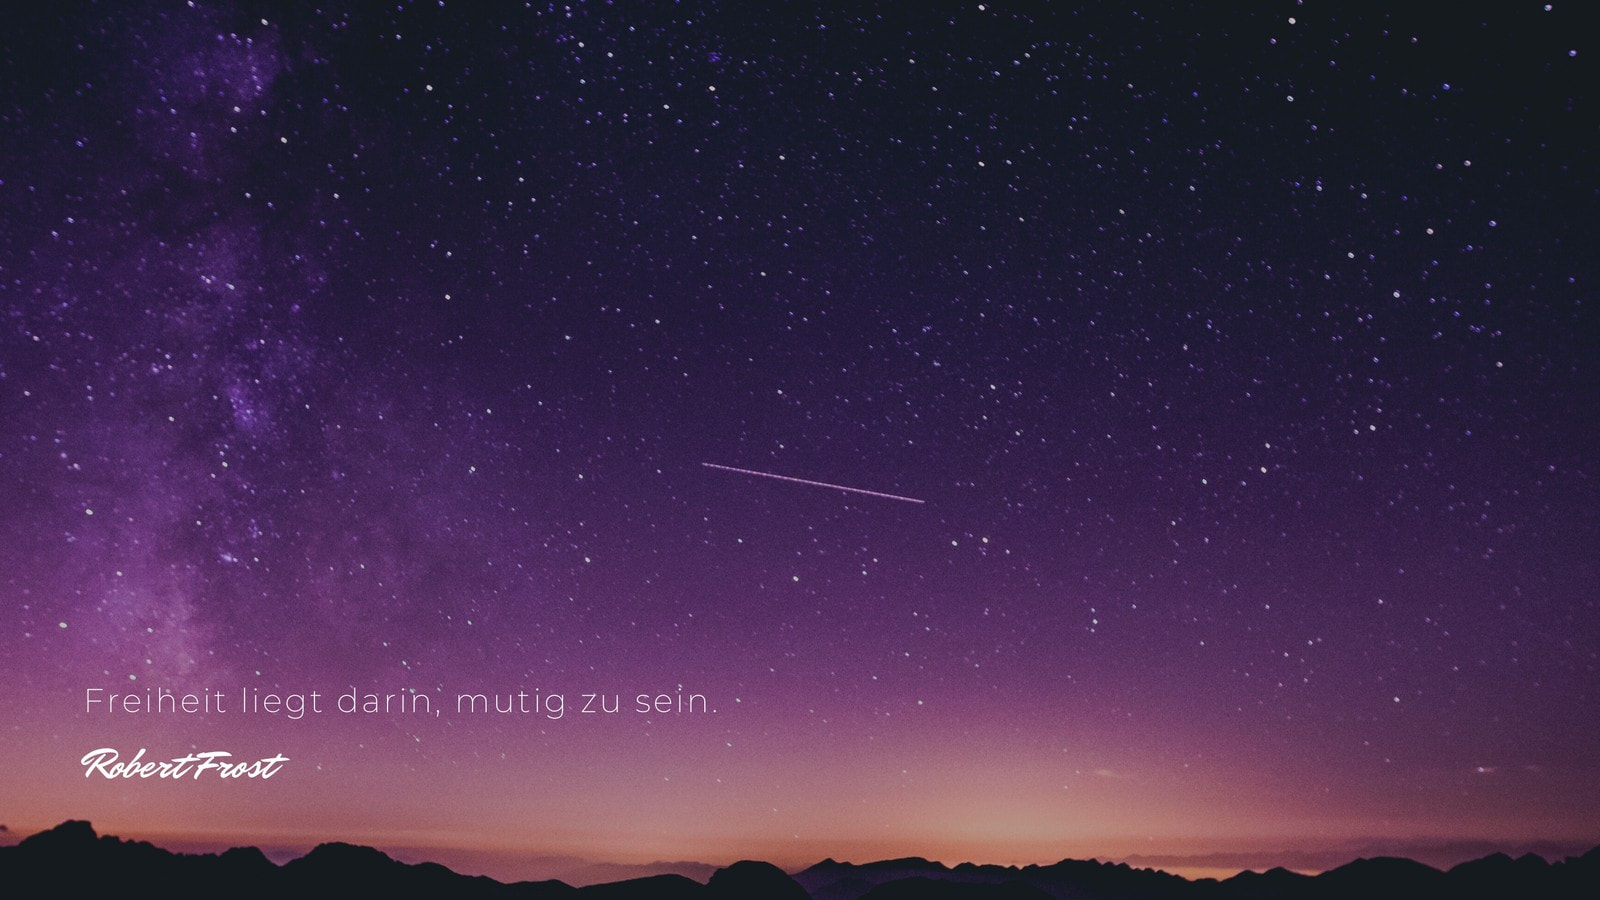 Himmel Draußen Natur Inspirierend Zitat Desktop Hintergrundbild